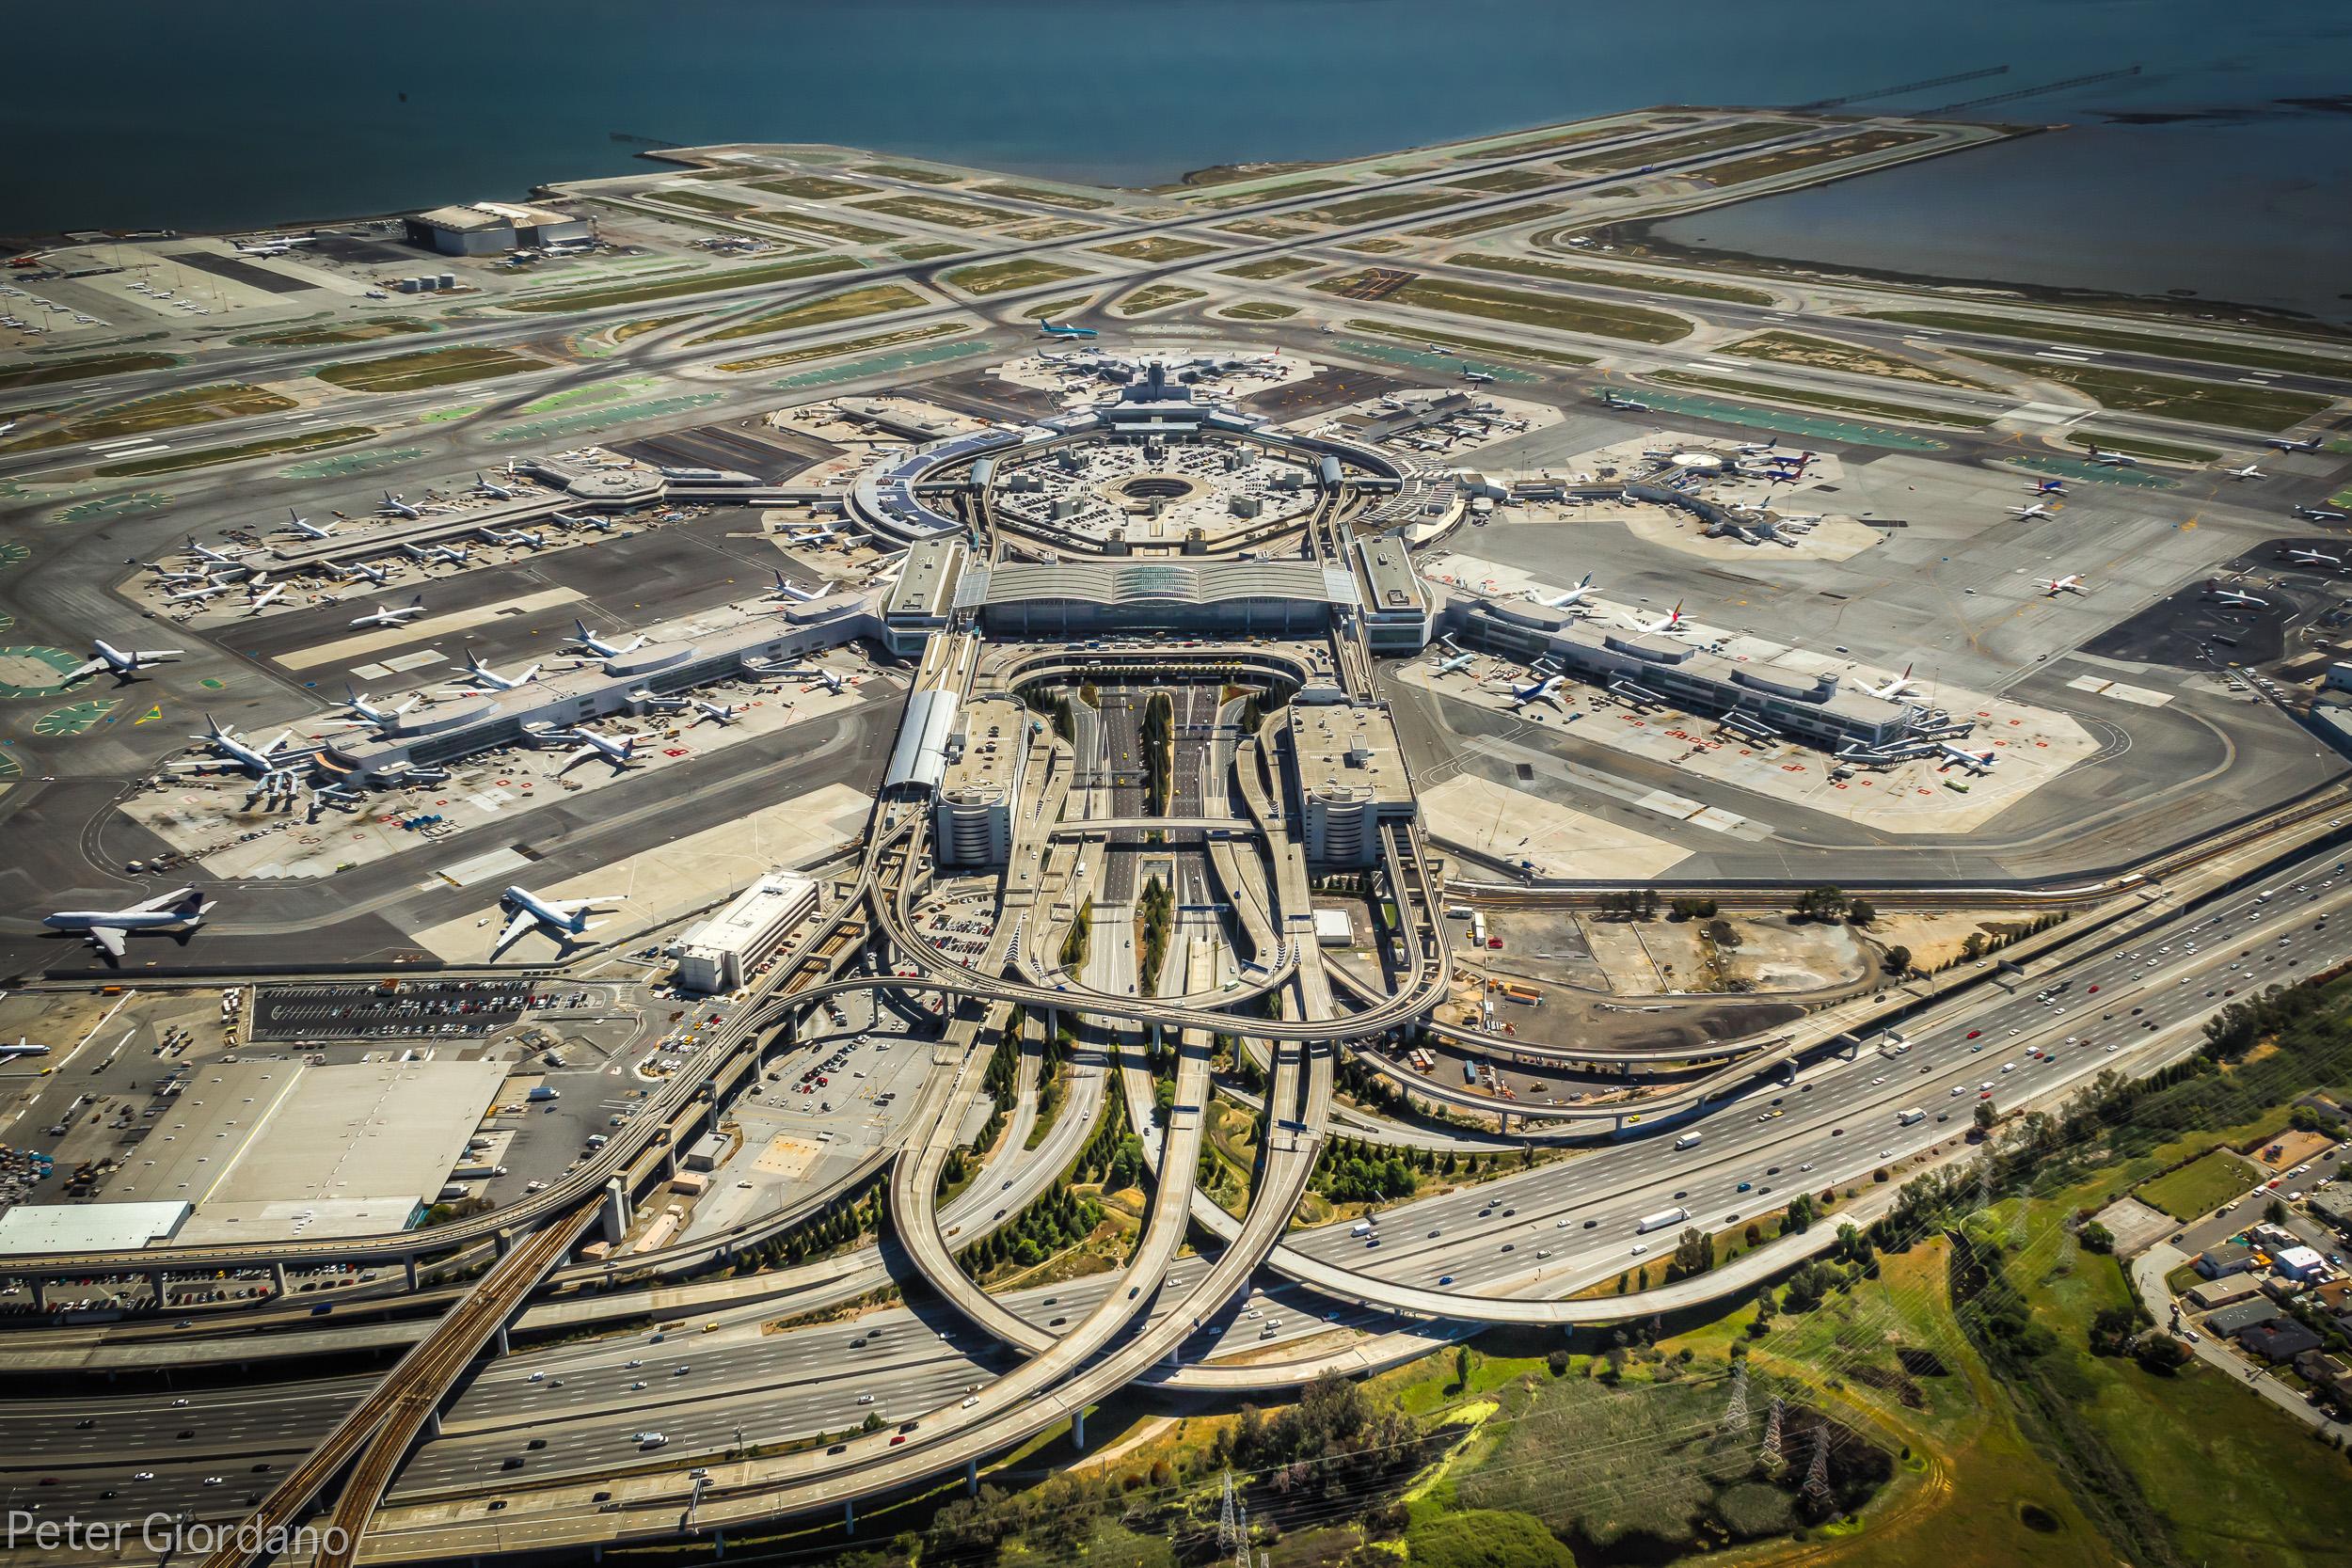 2012-05-10 - SFO Airport from Zeppelin (1 of 1).jpg